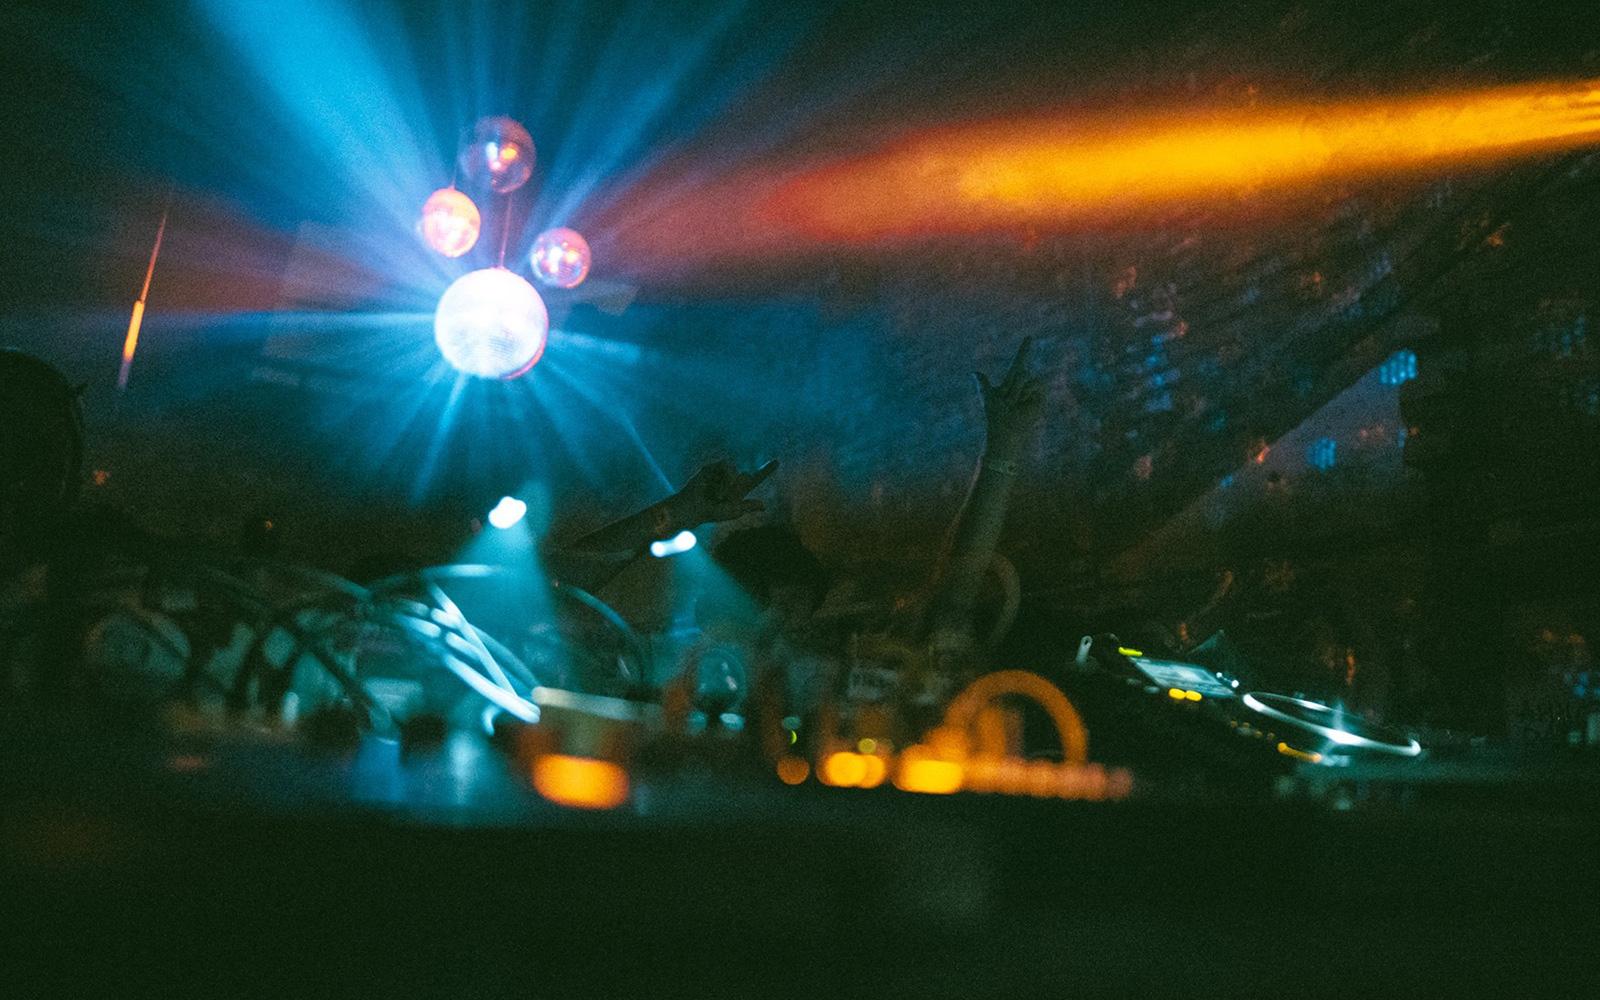 RA: Inside Colombia's world-class techno scene